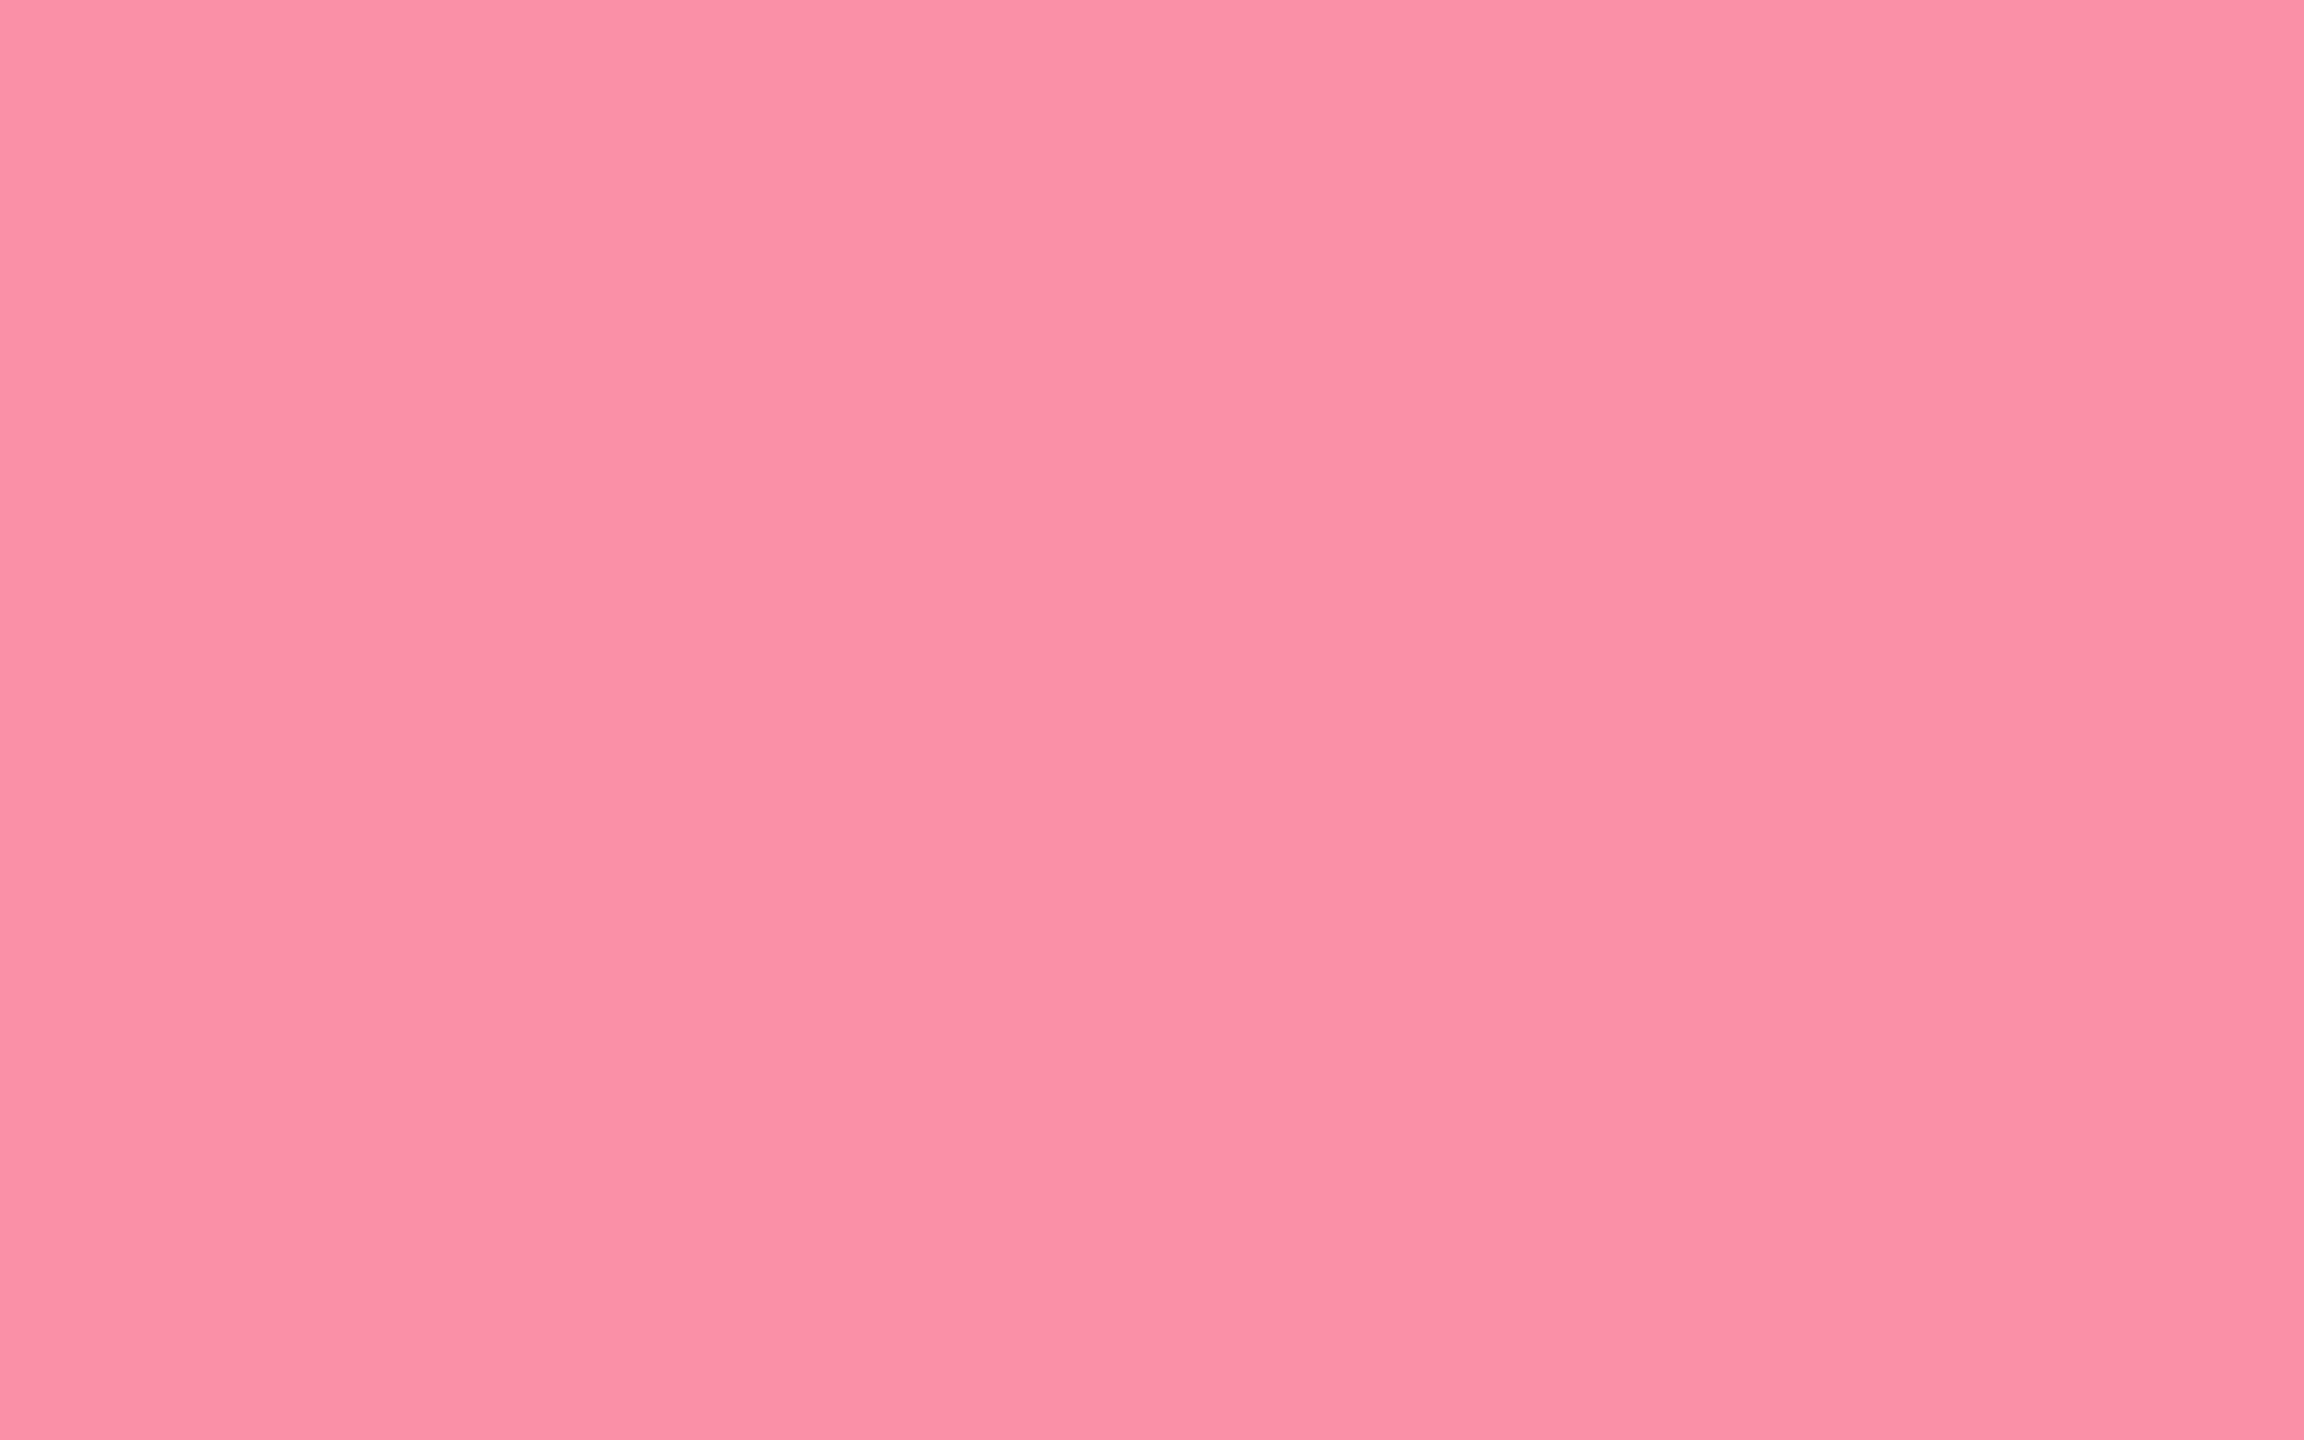 2304x1440 Pink Sherbet Solid Color Background